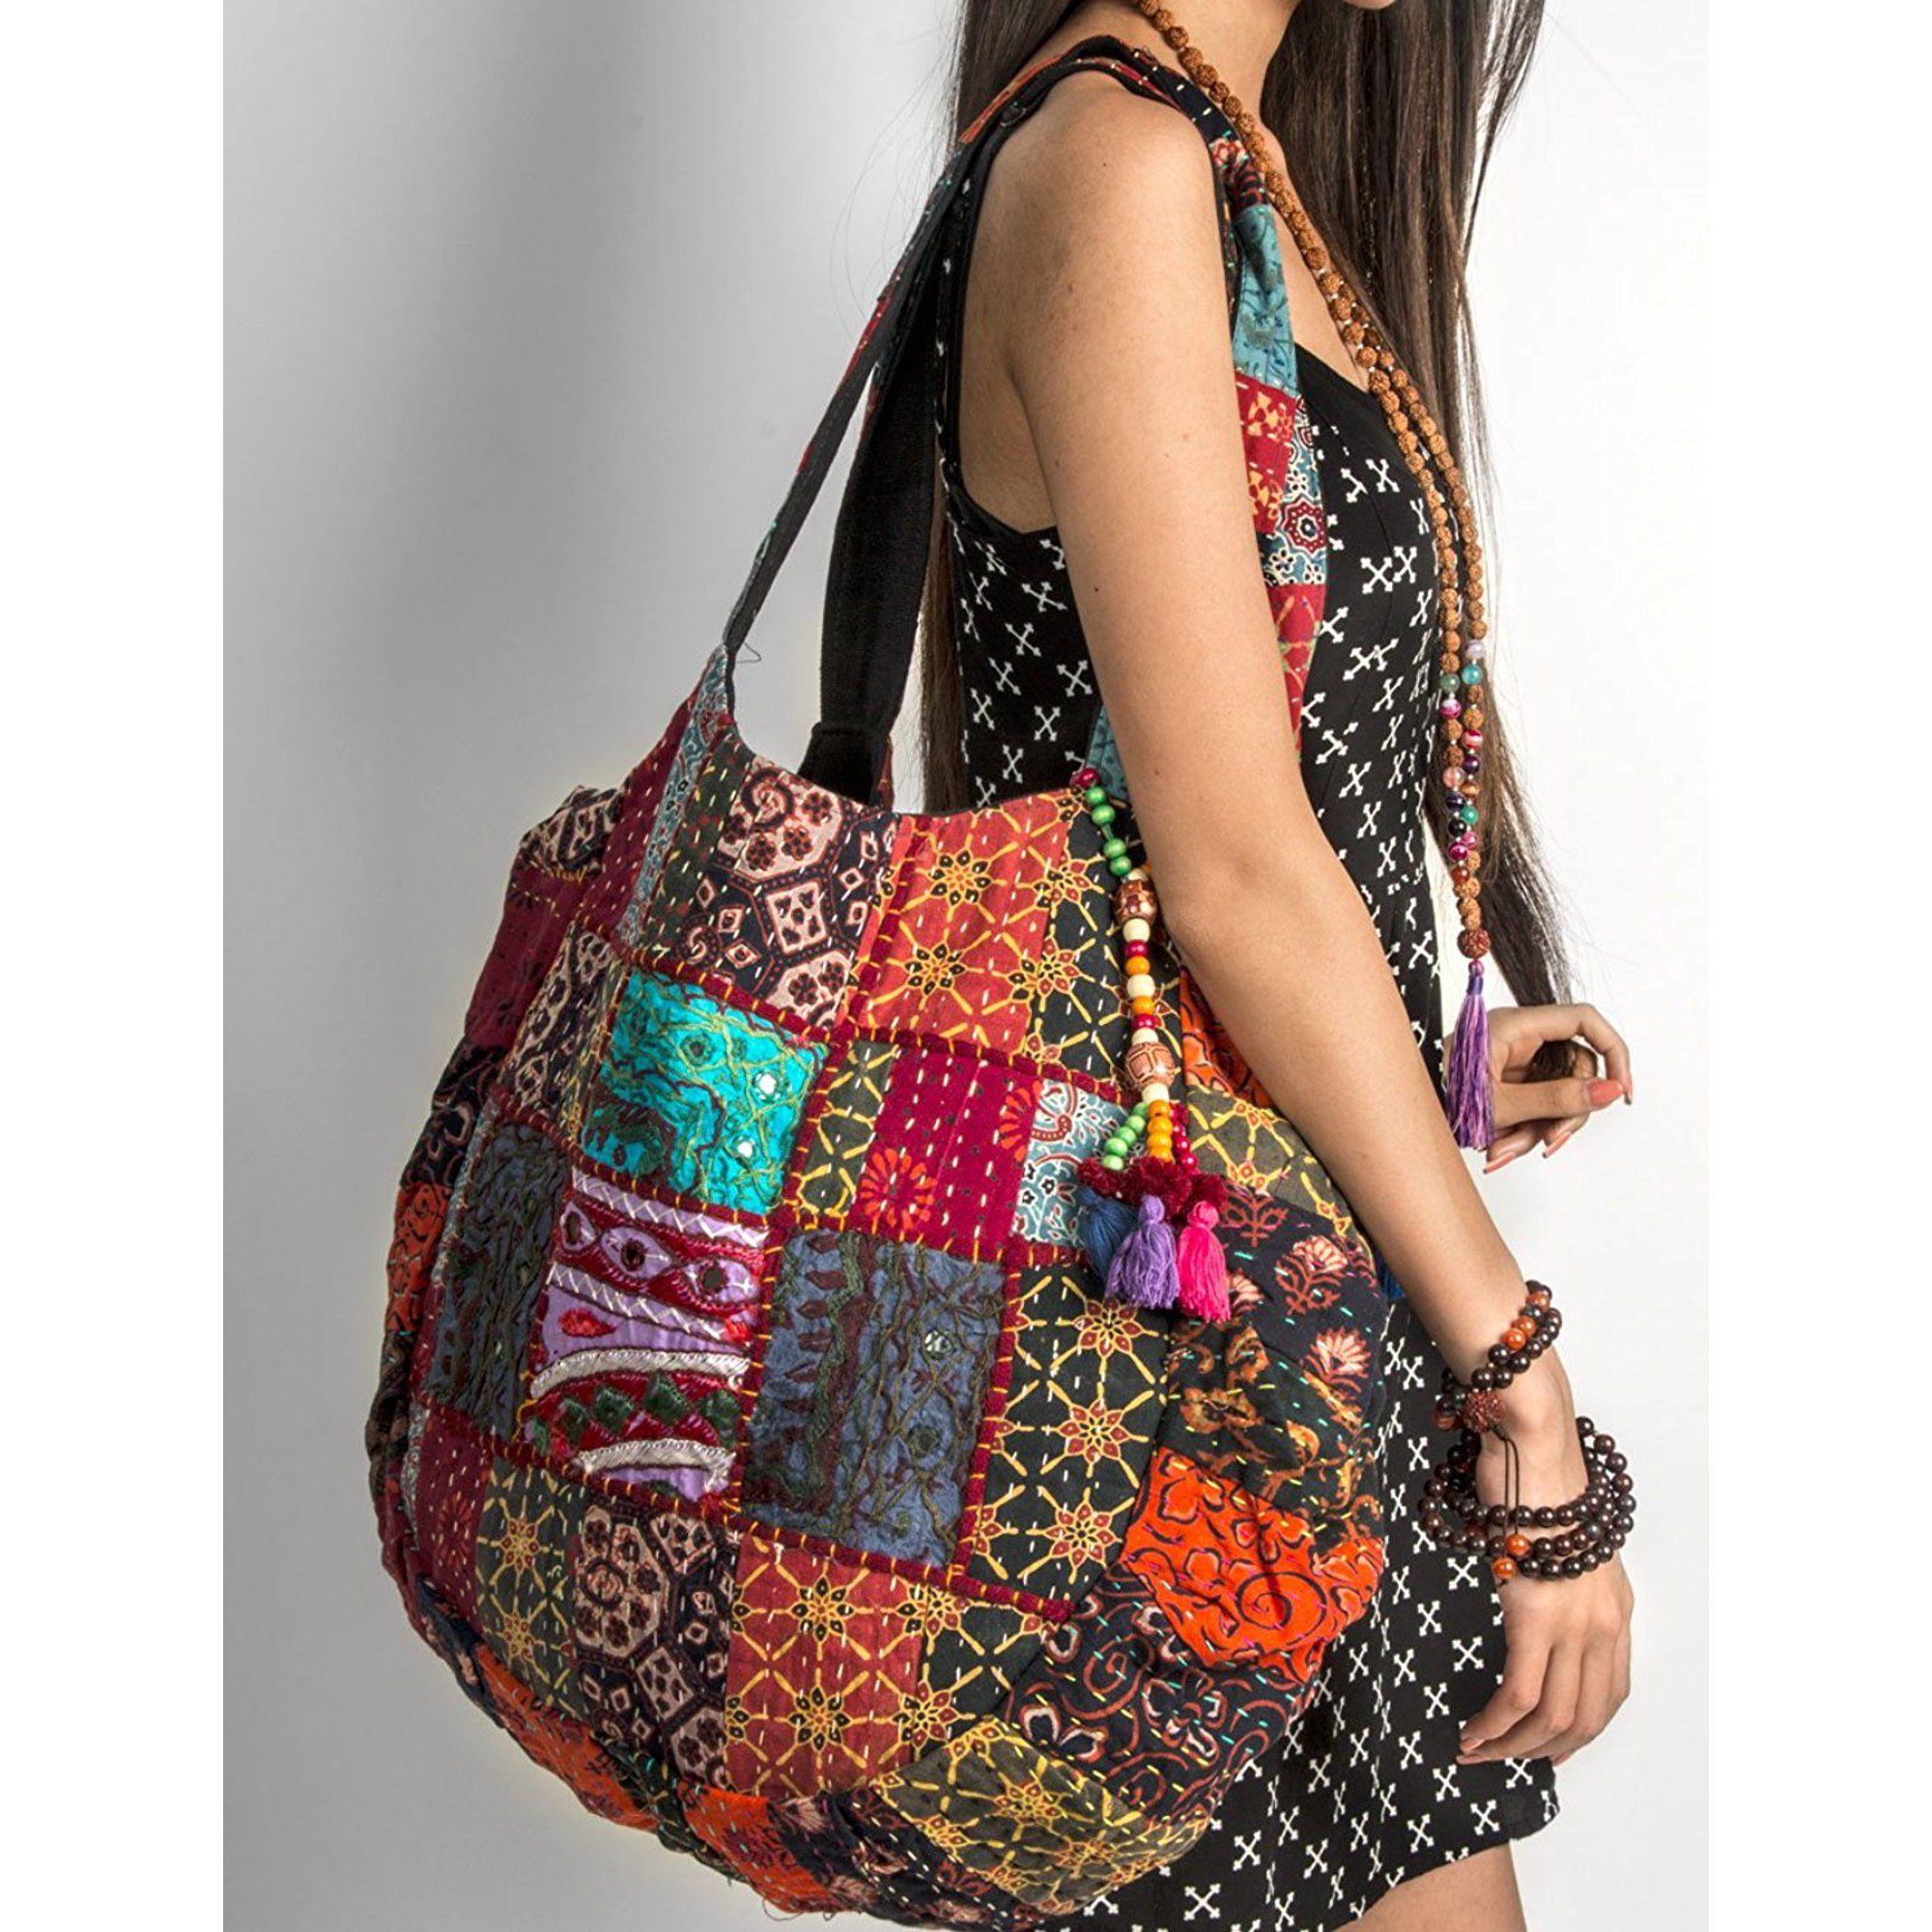 Boho tote bag  Bohemian Bag  Beach bag